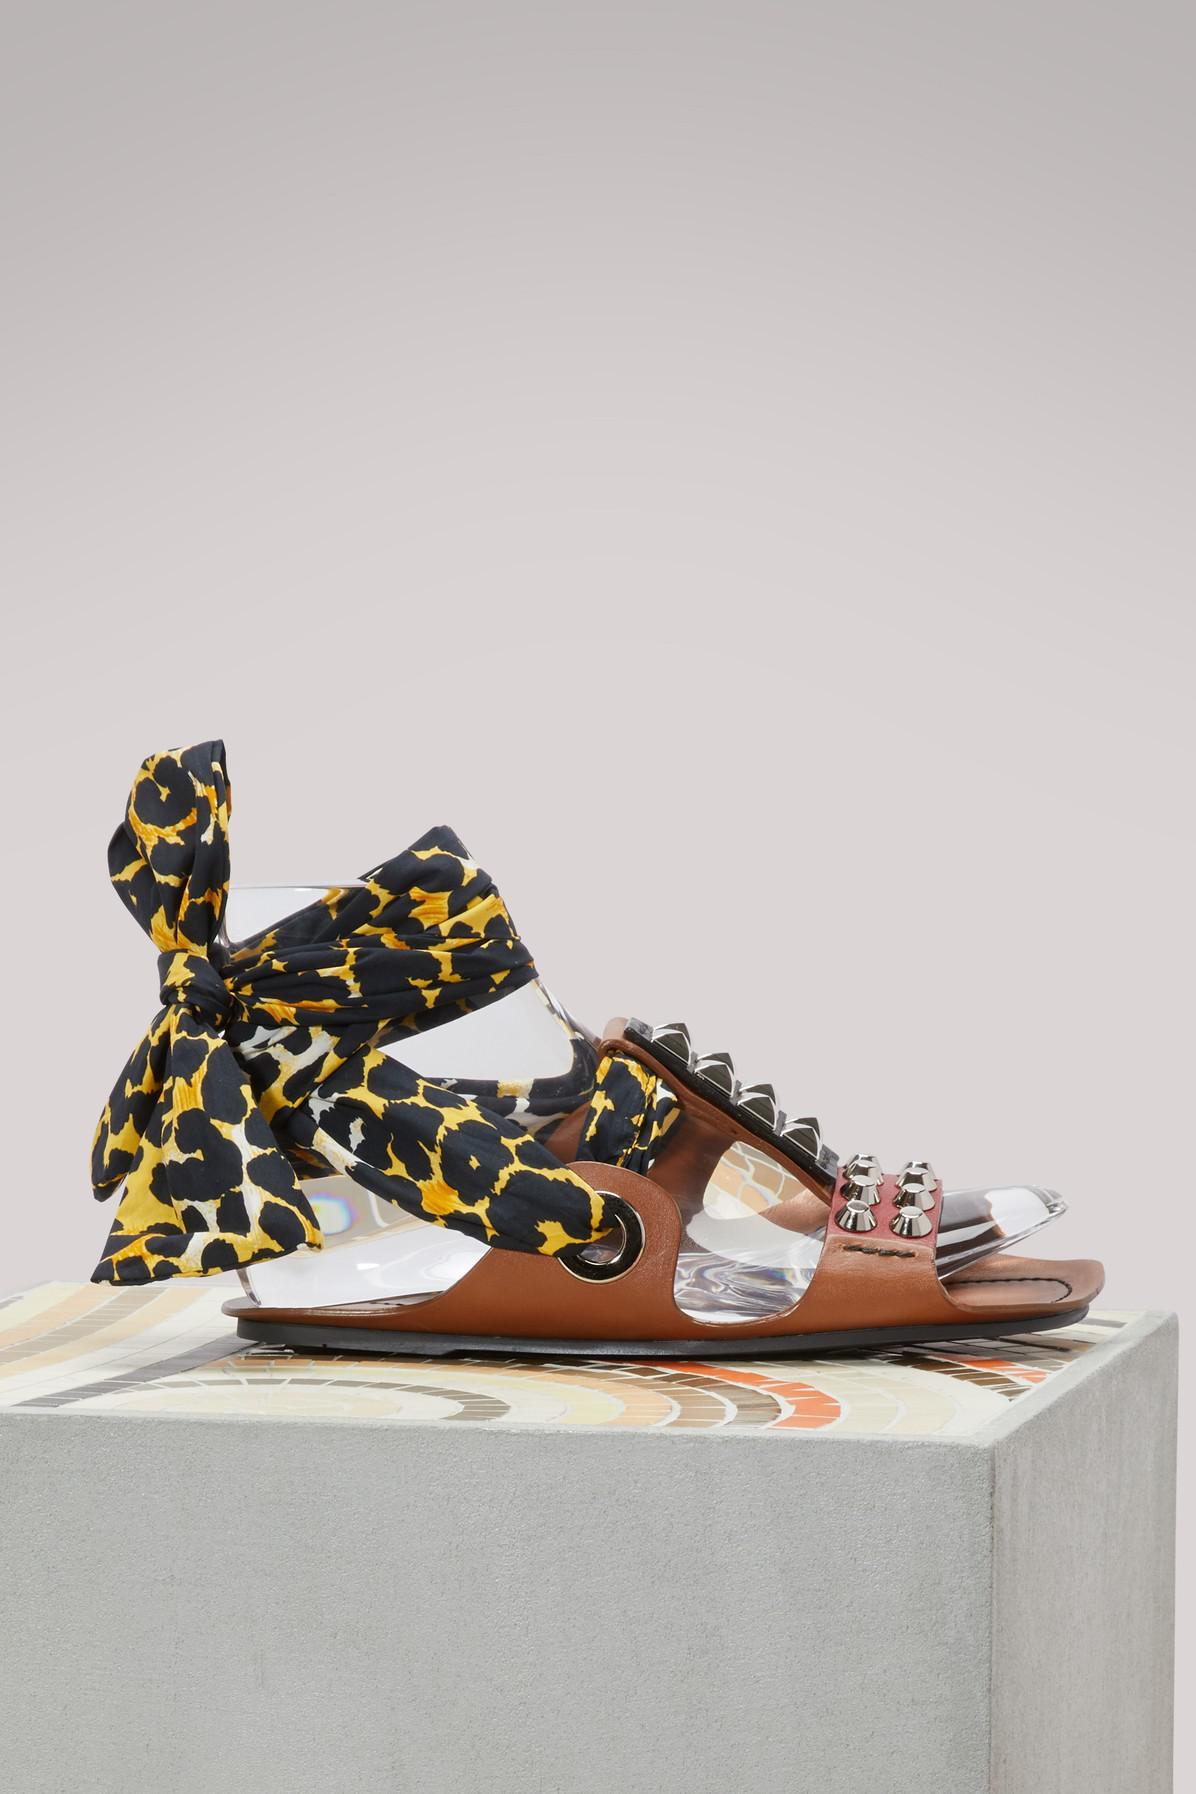 Prada Studded sandals with scarf Lov0pS9mF6